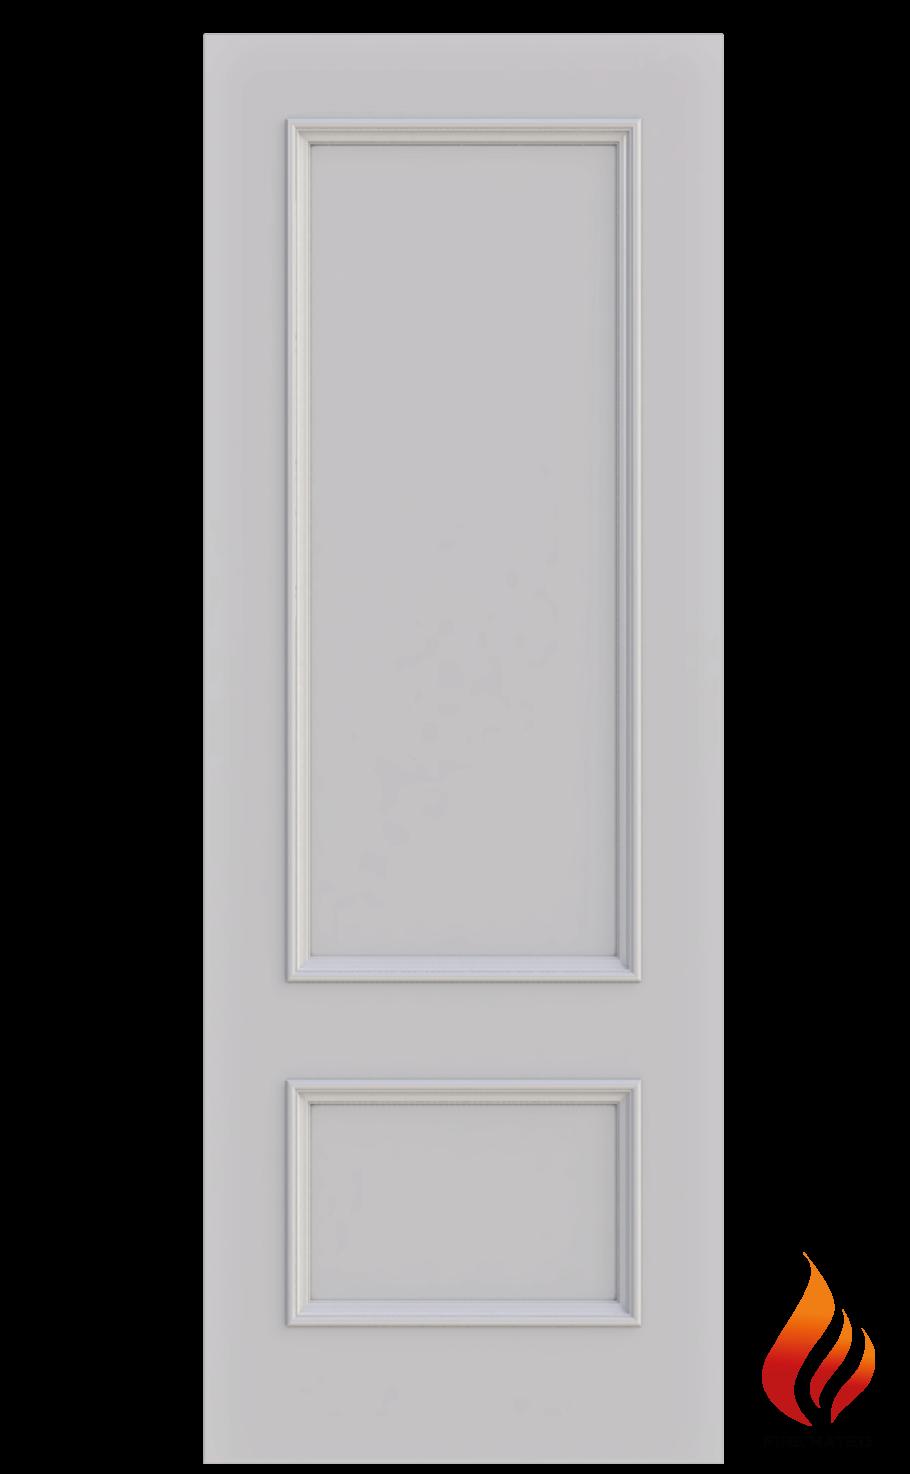 Made To Measure Fire Doors Fd30 Bespoke Custom Doors Uk Ireland